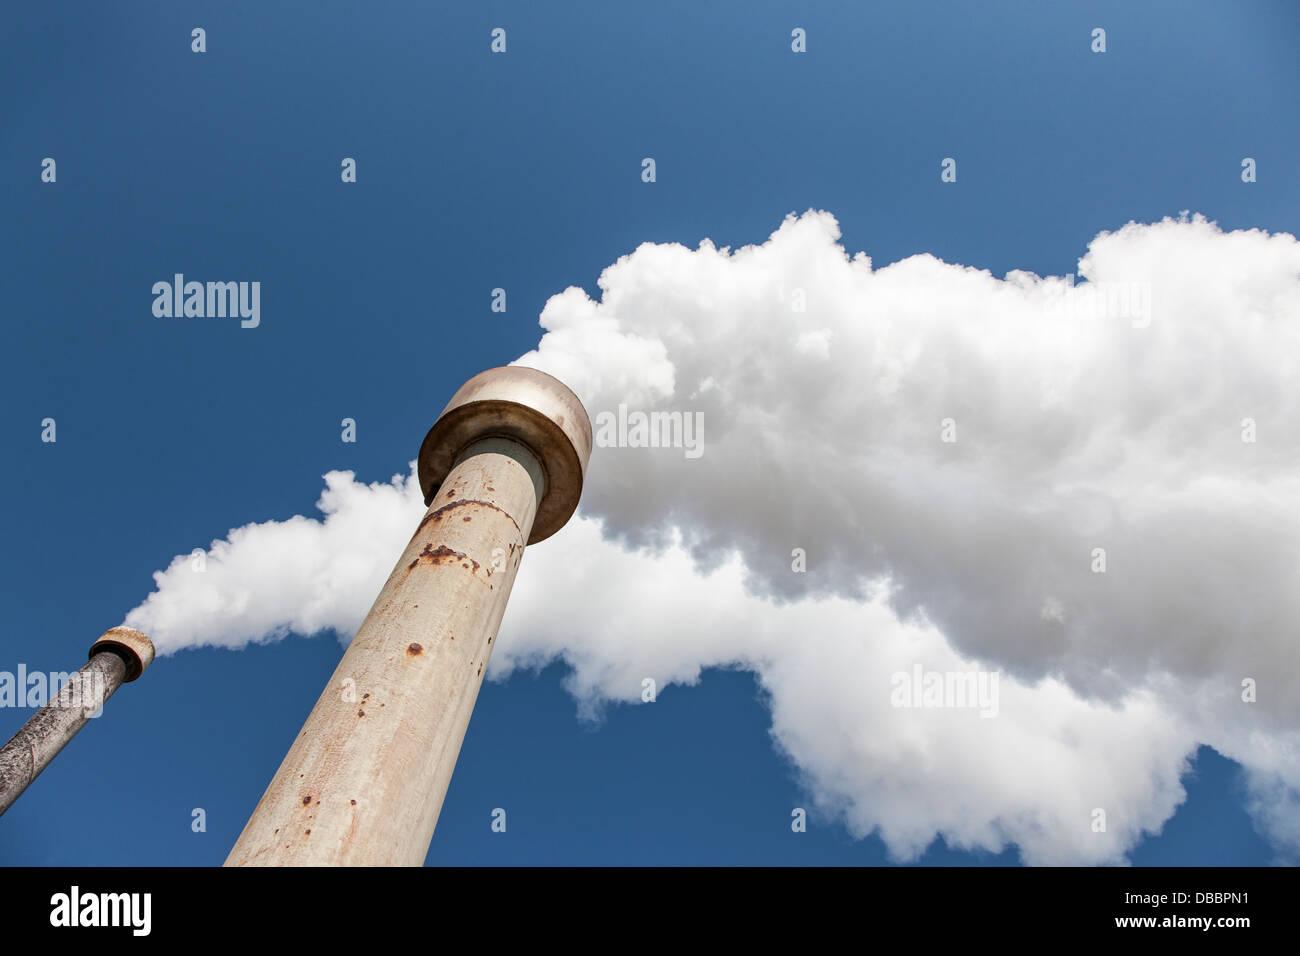 Große Menge an Rauch aus einer Fabrik Stockbild